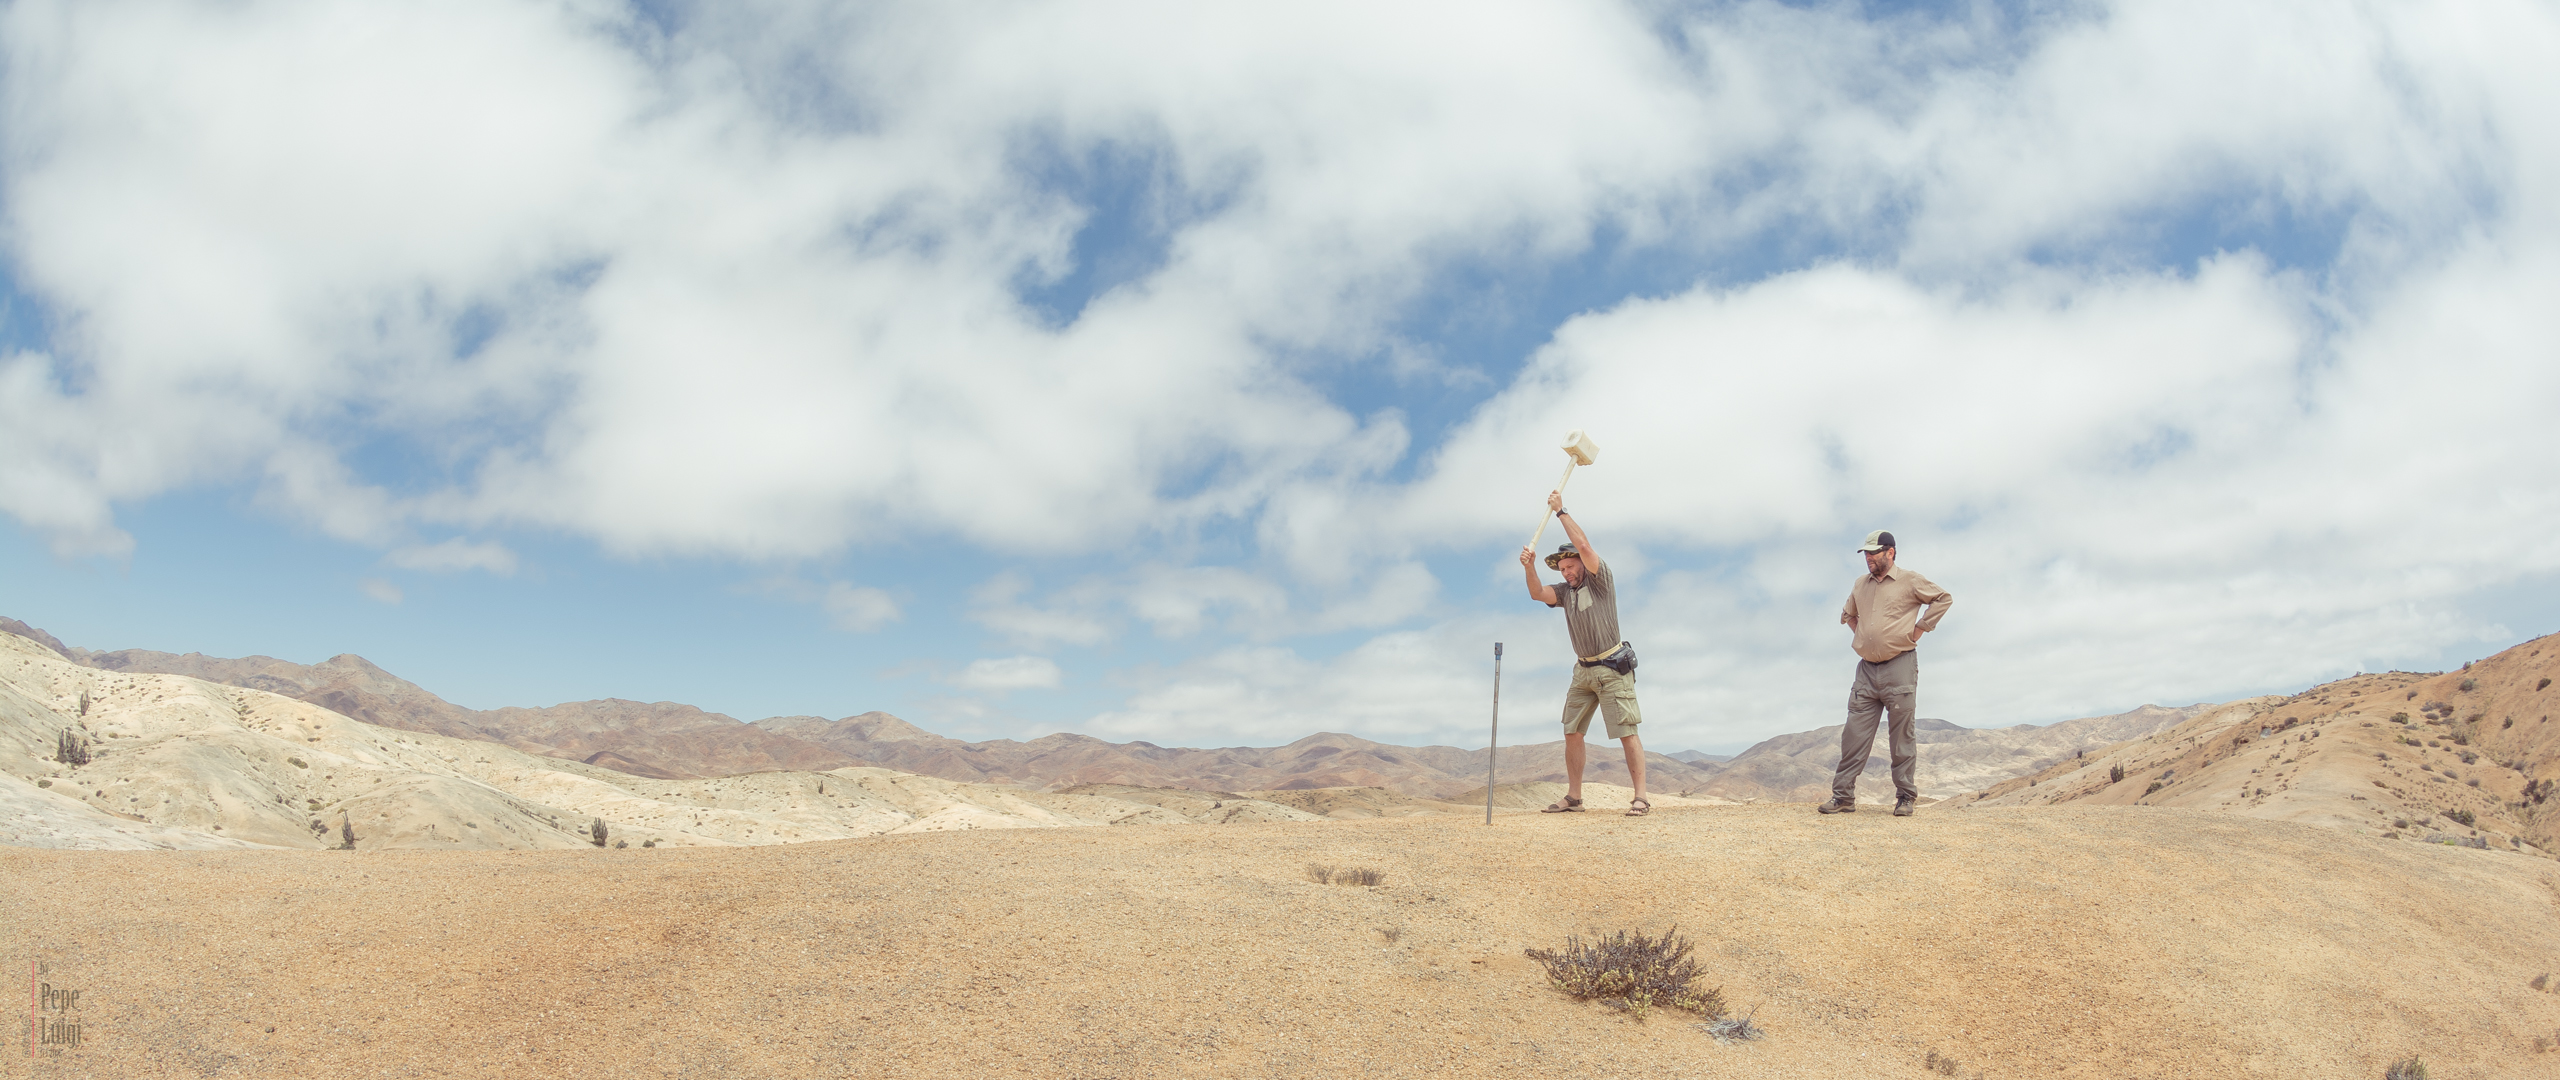 Geology | Earthshape Project | Parque Nacional Pan de Azúcar